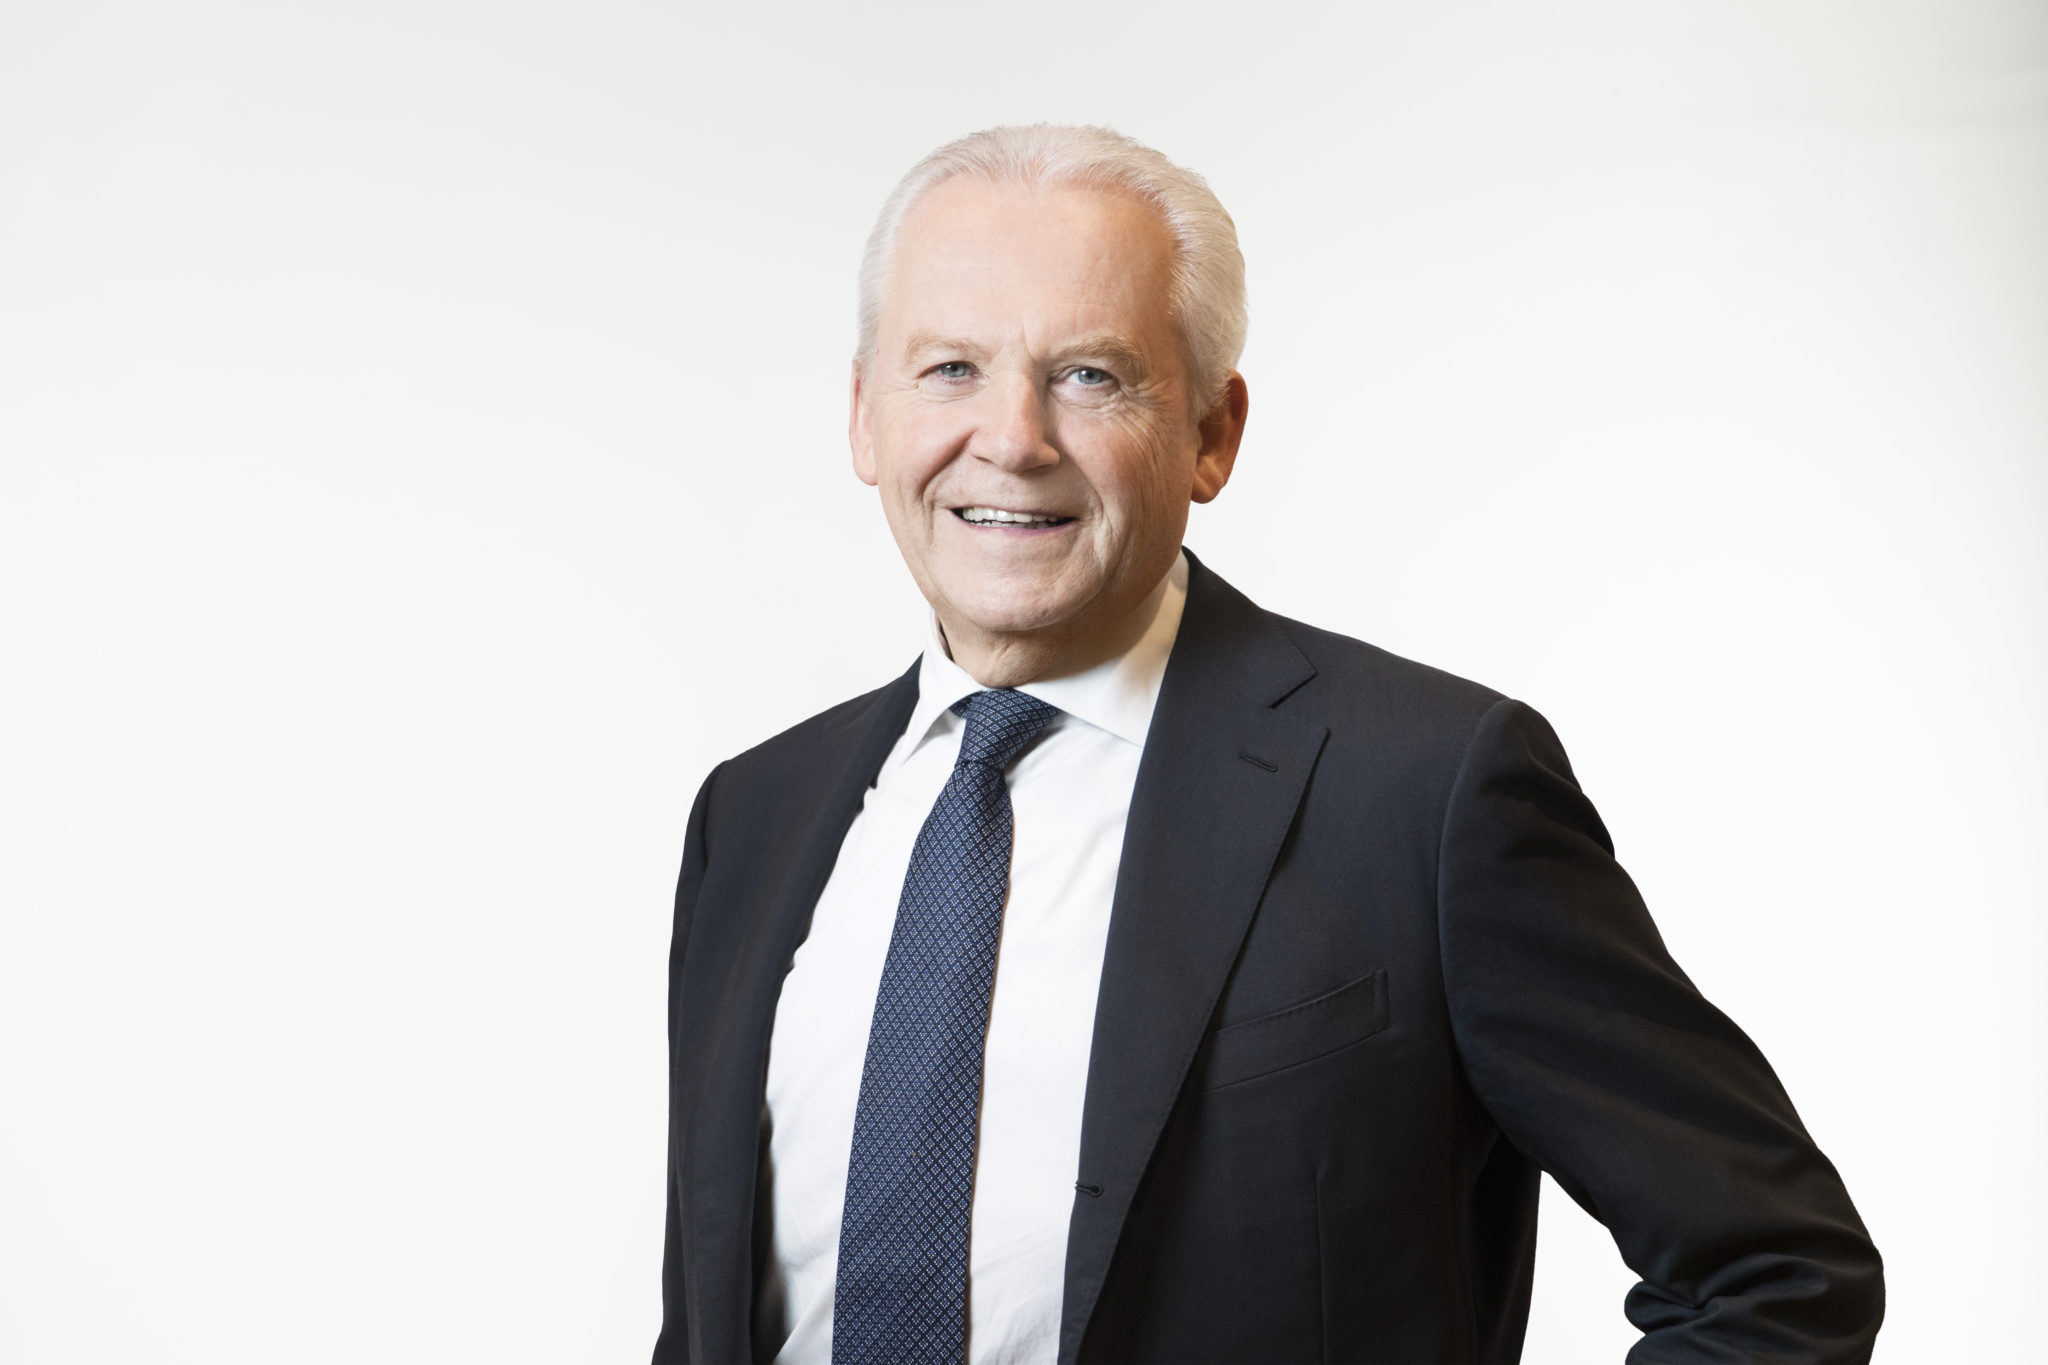 ew Chairman of the Supervisory Board at Bombardier Transportation –Professor Rüdiger Grube